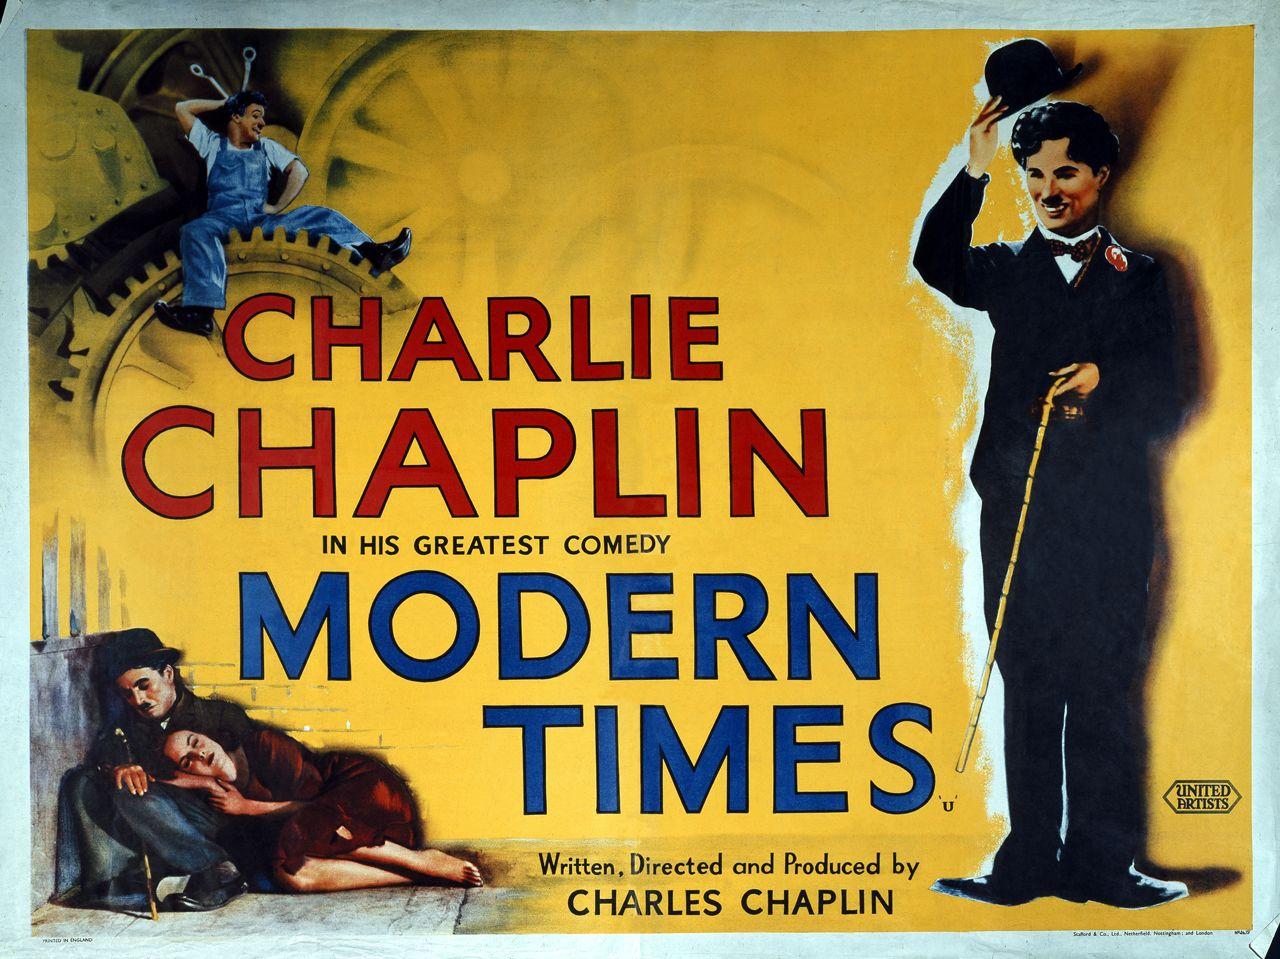 Modern Times 1936 Lobby Card Charlie Chaplin Movies Charlie